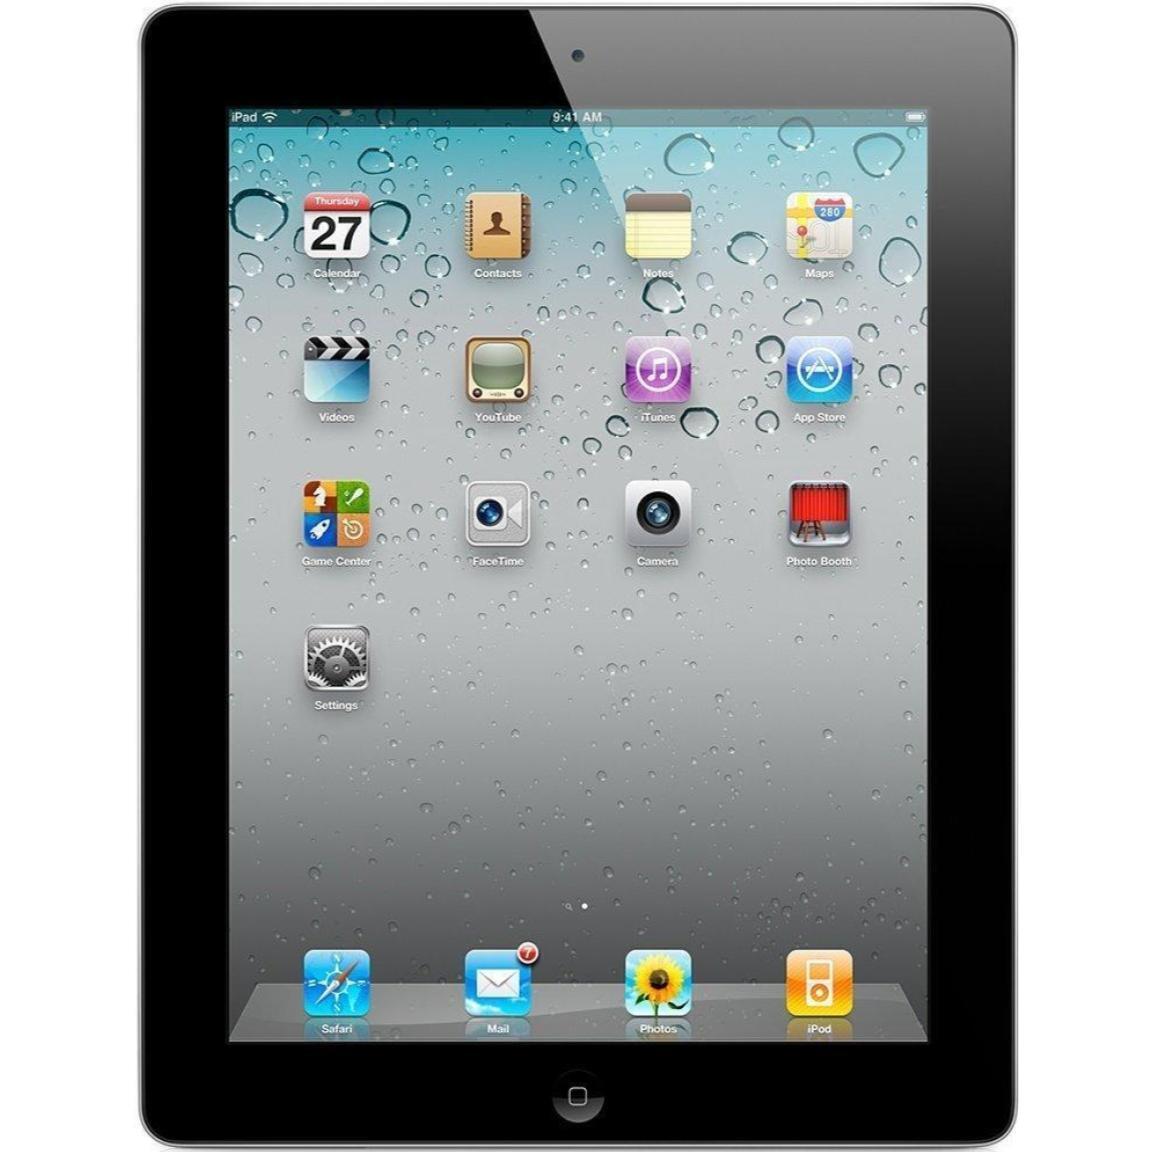 Apple iPad 2 - WiFi - 16GB 32GB 64GB, Black or White - Good Condition! A1359